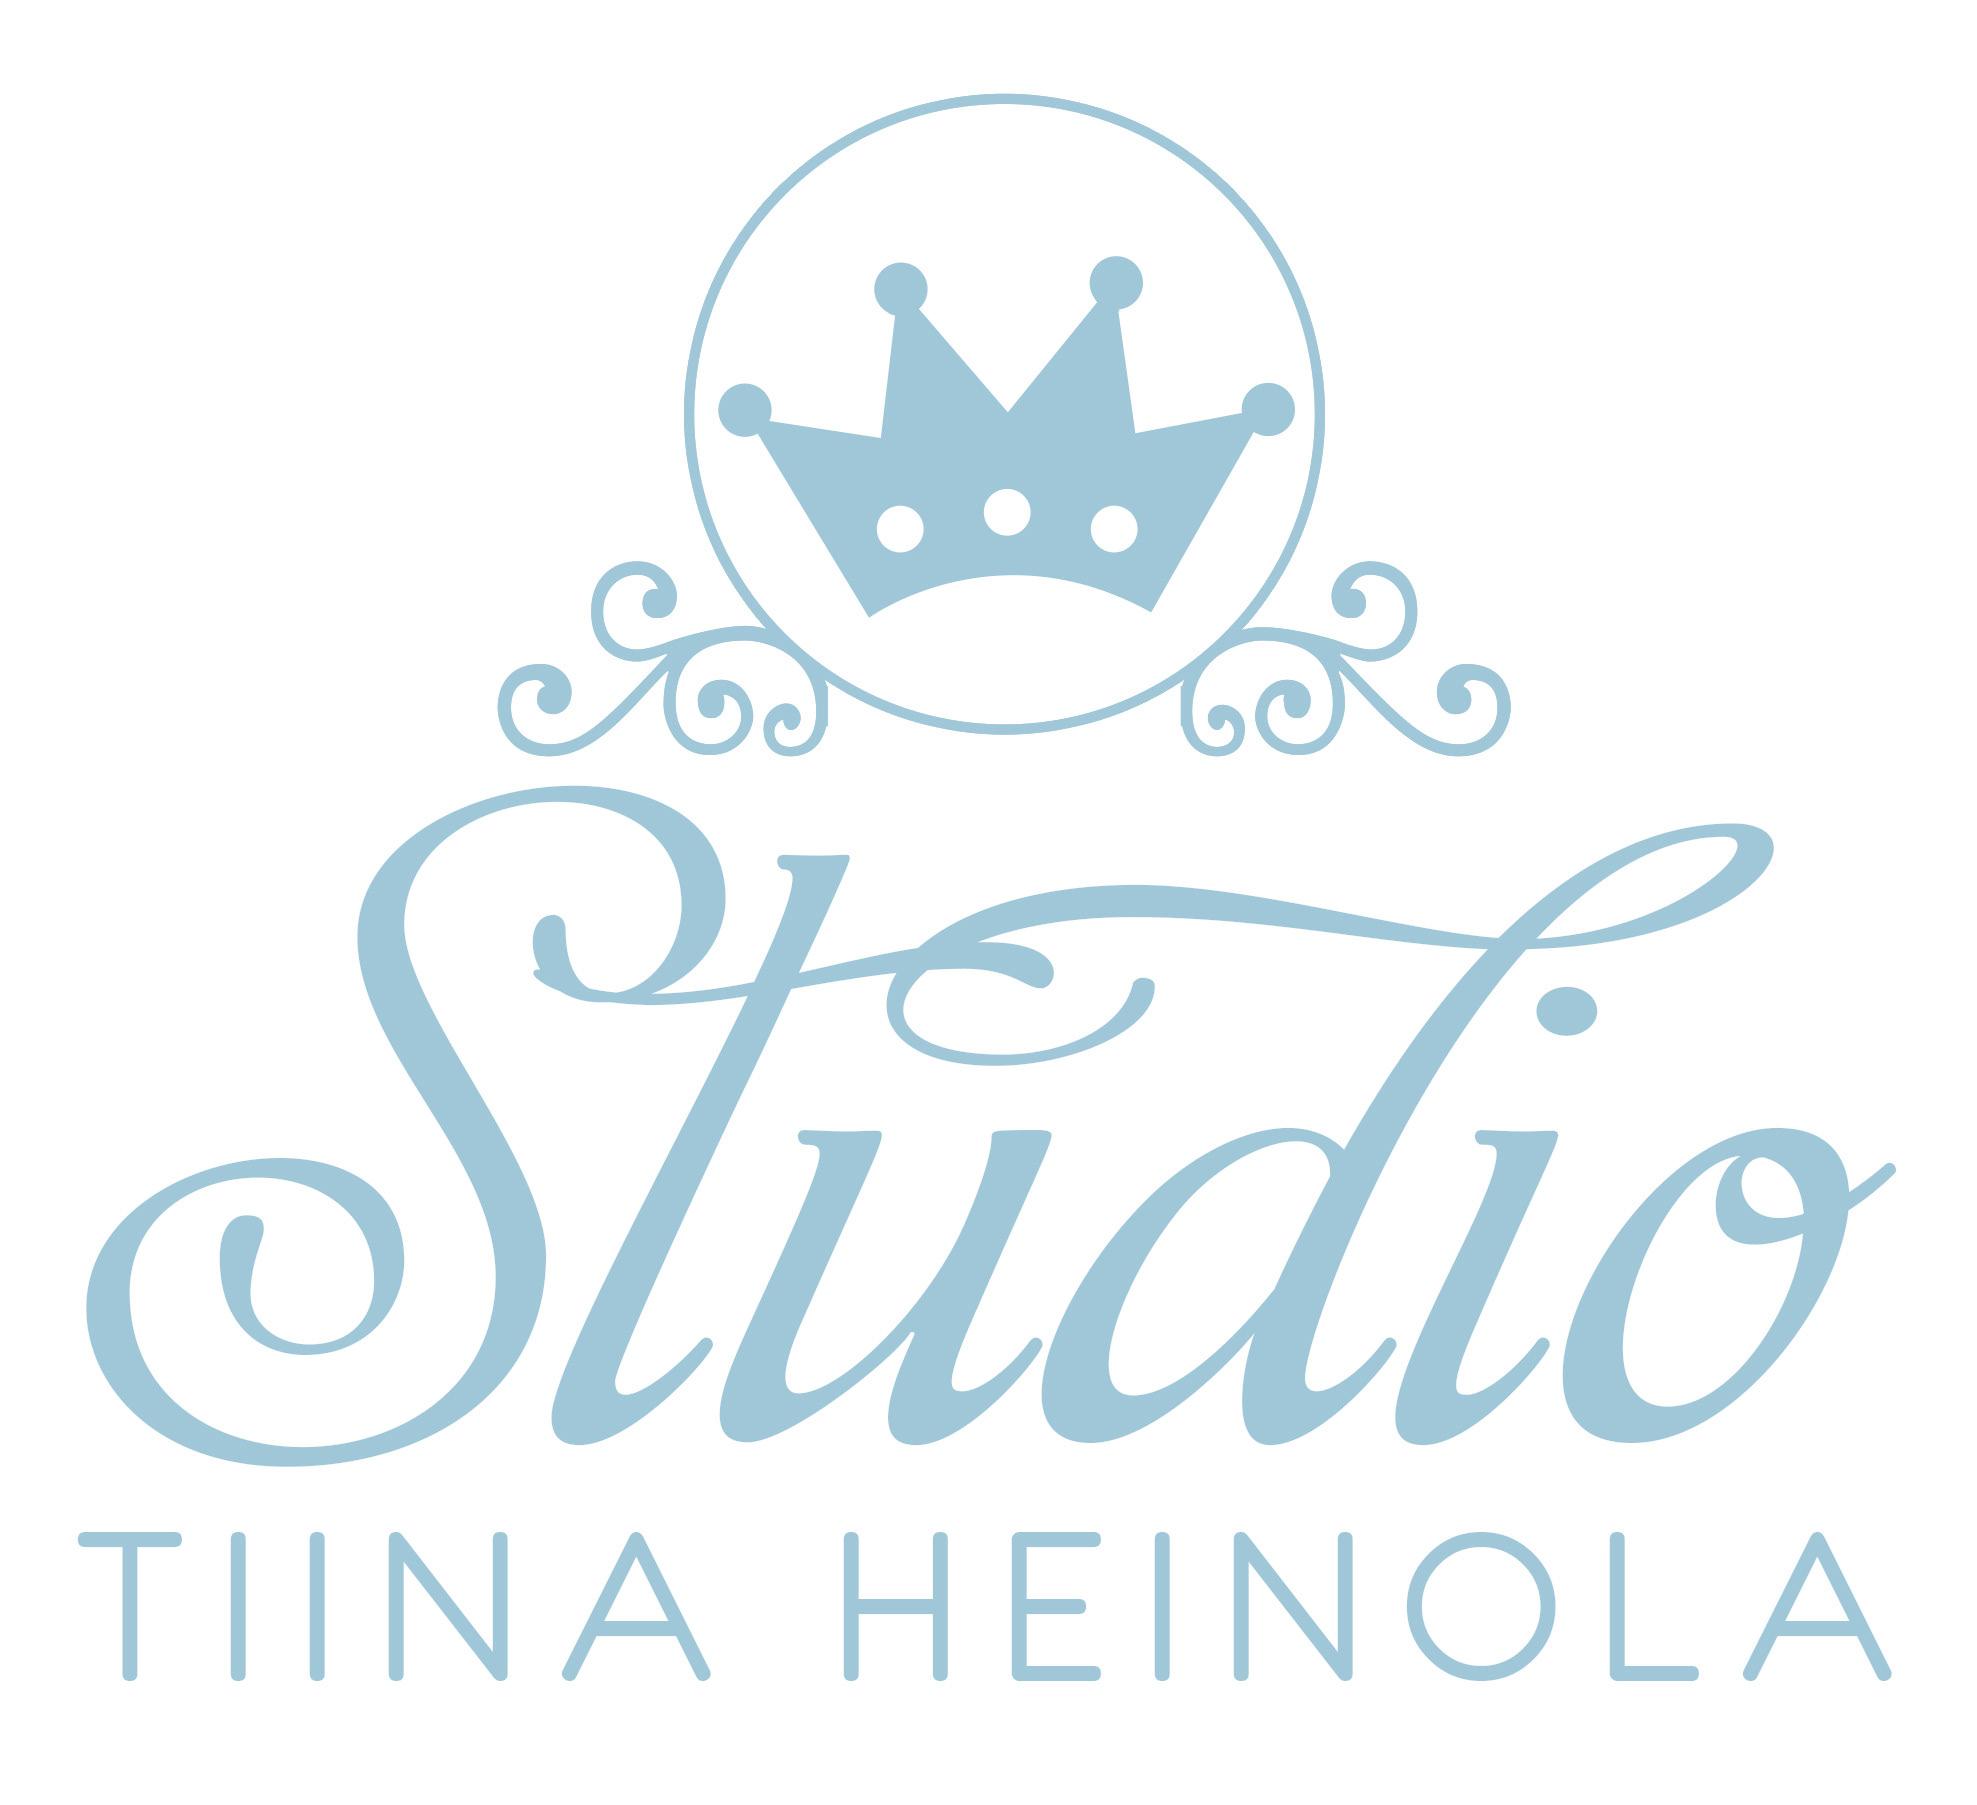 Studio Tiina Heinola